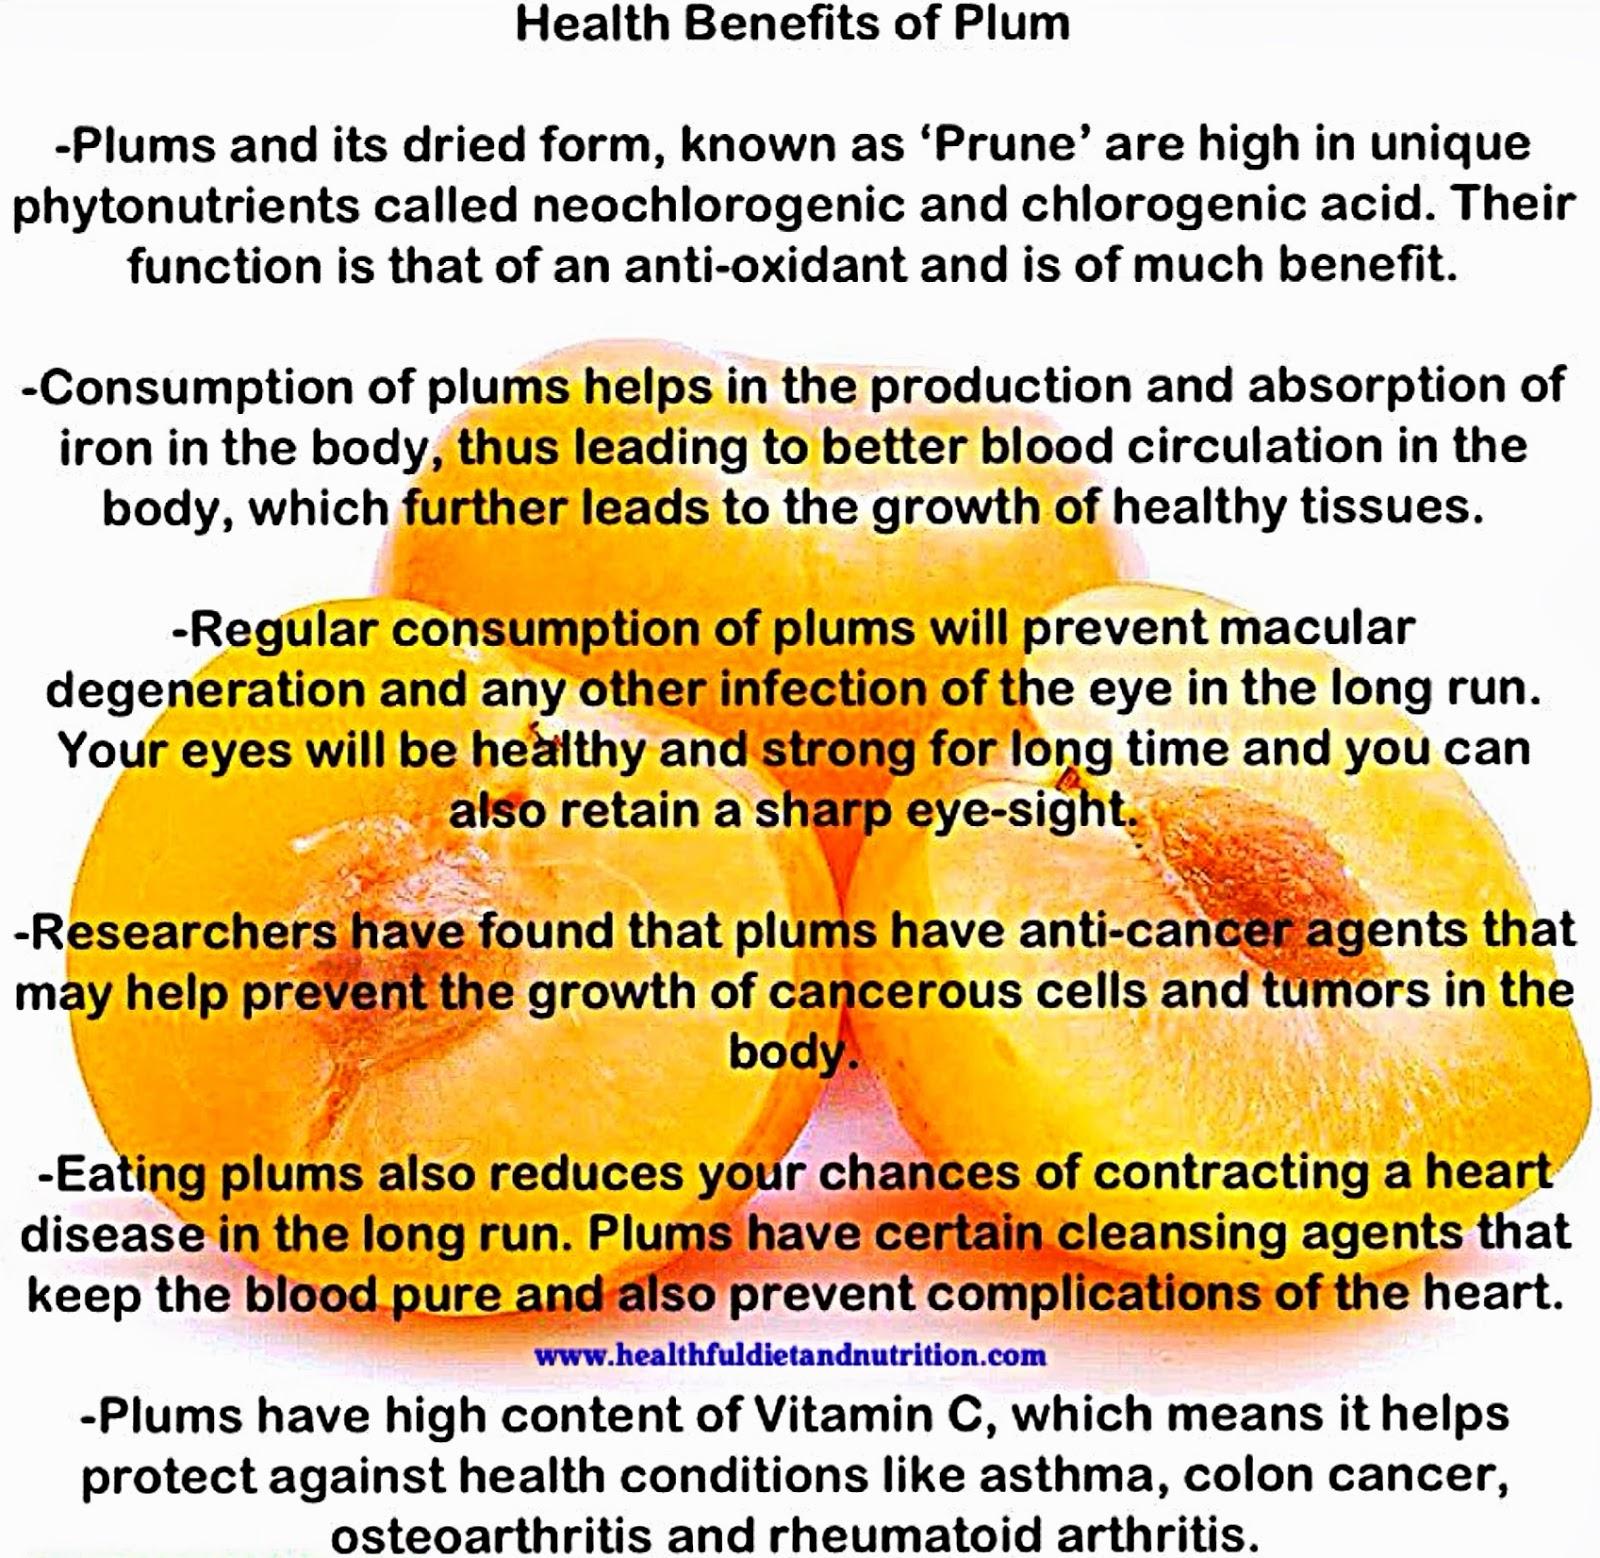 Health Benefits of Plum